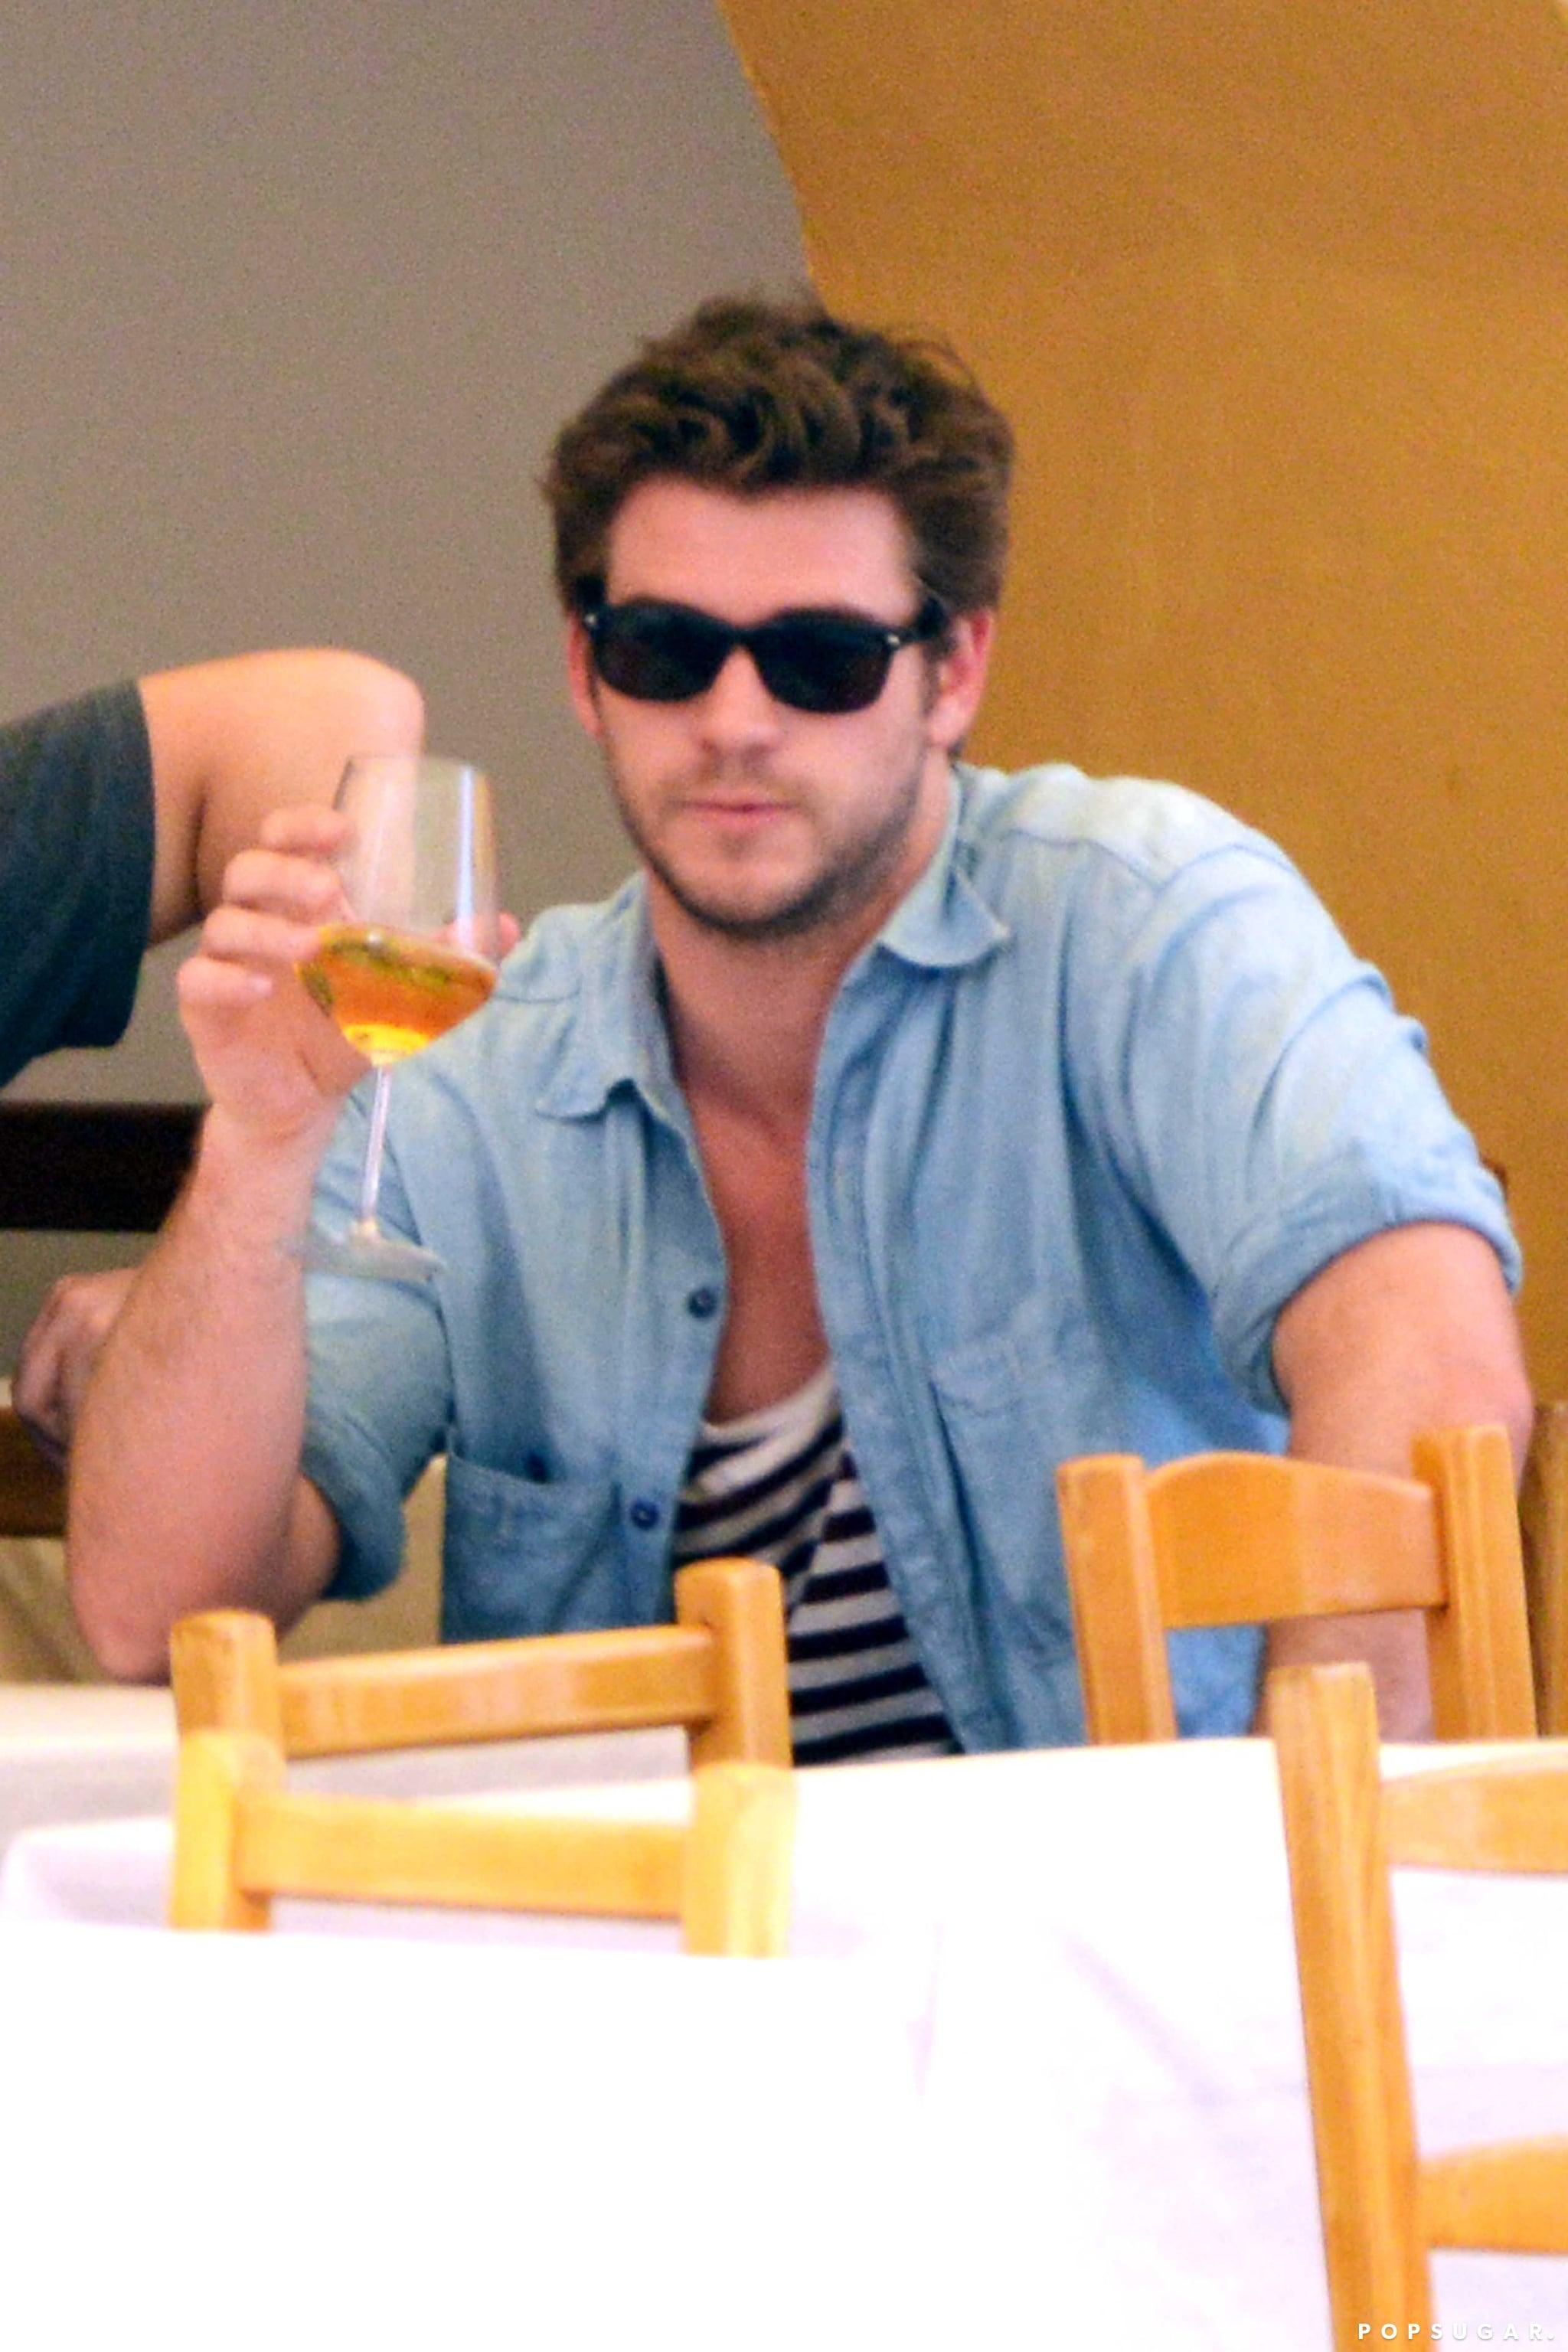 Liam Hemsworth Tastes the Life of Luxury From His Tiny, Tiny Glass